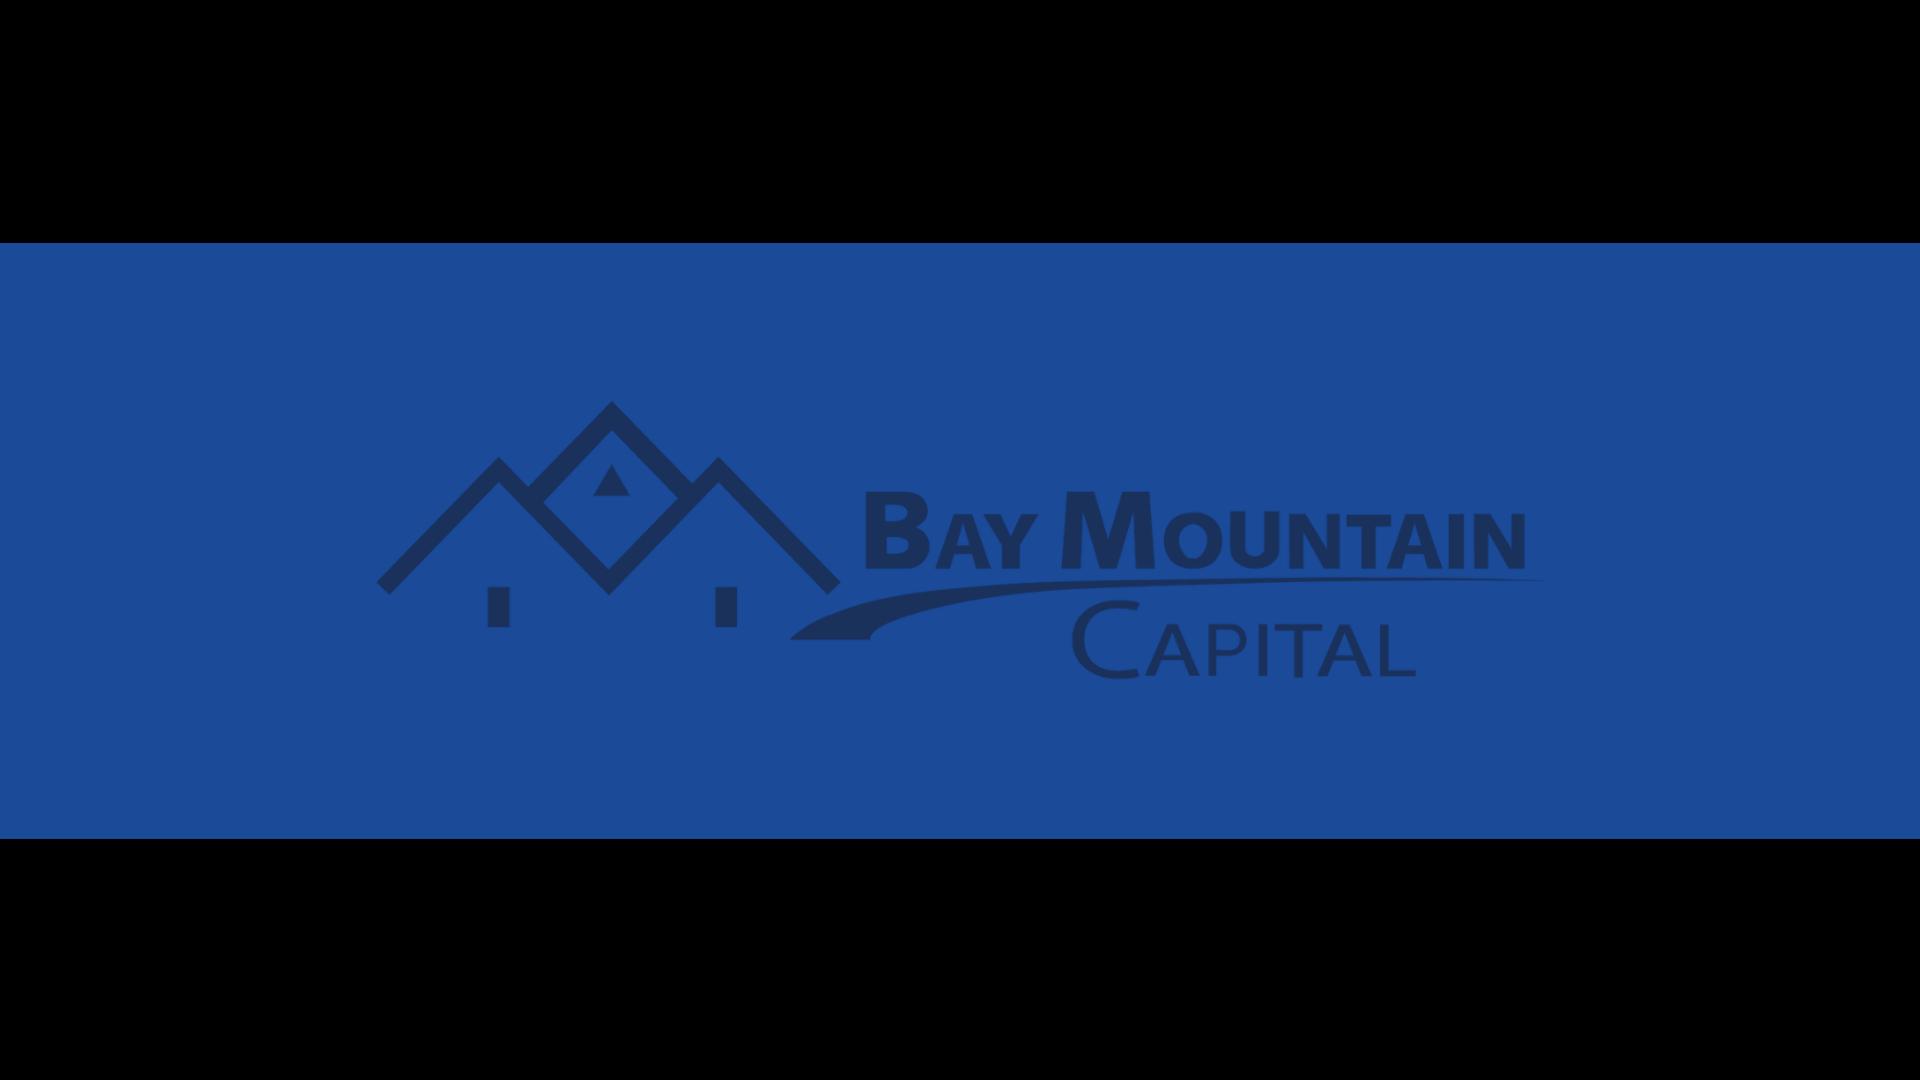 $200 Million Mark Hit by Bay Mountain Capital